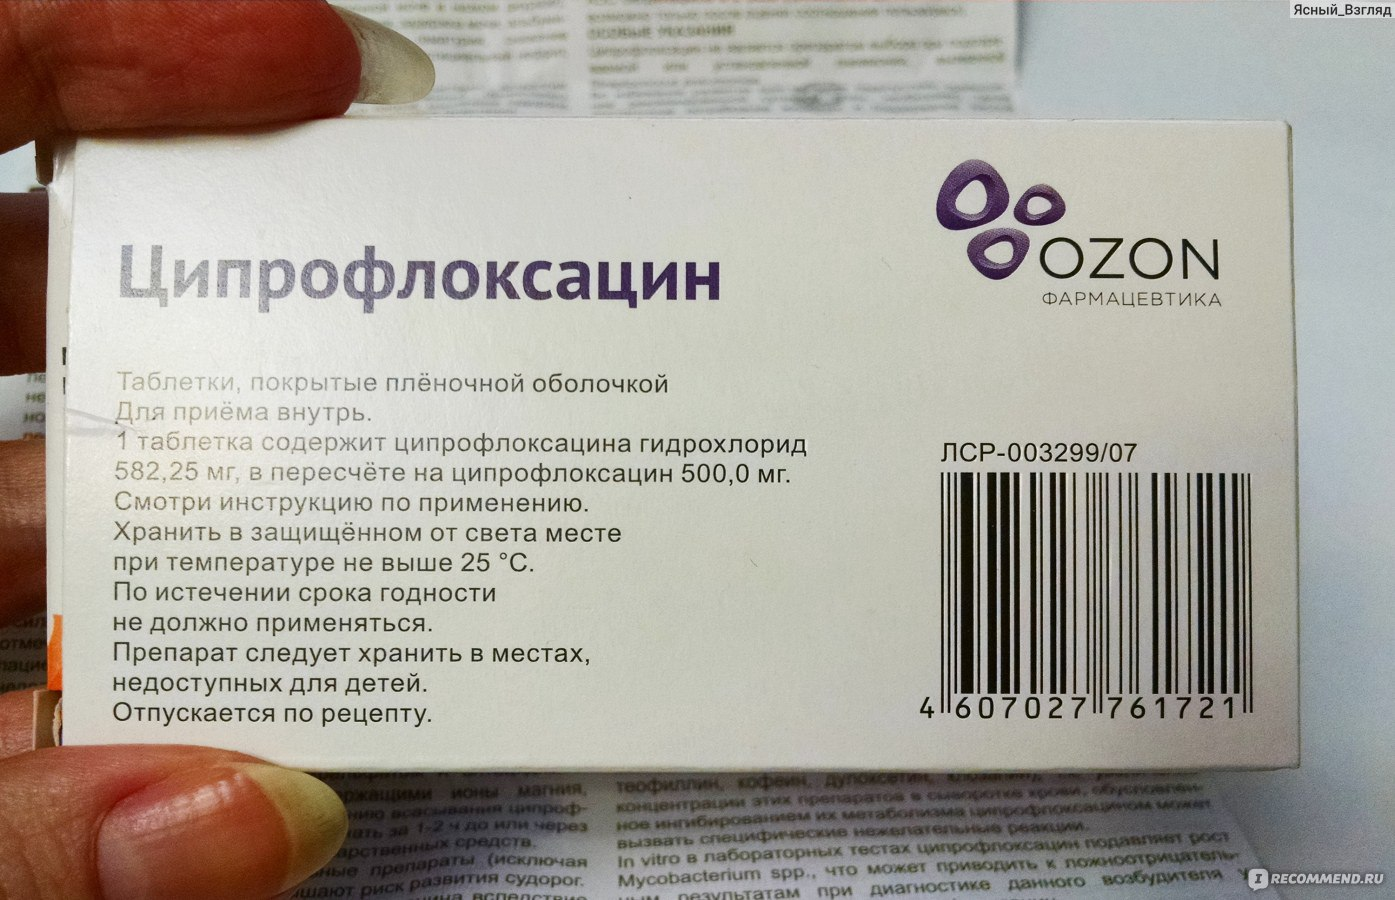 Fogg filler ciprofloxacin